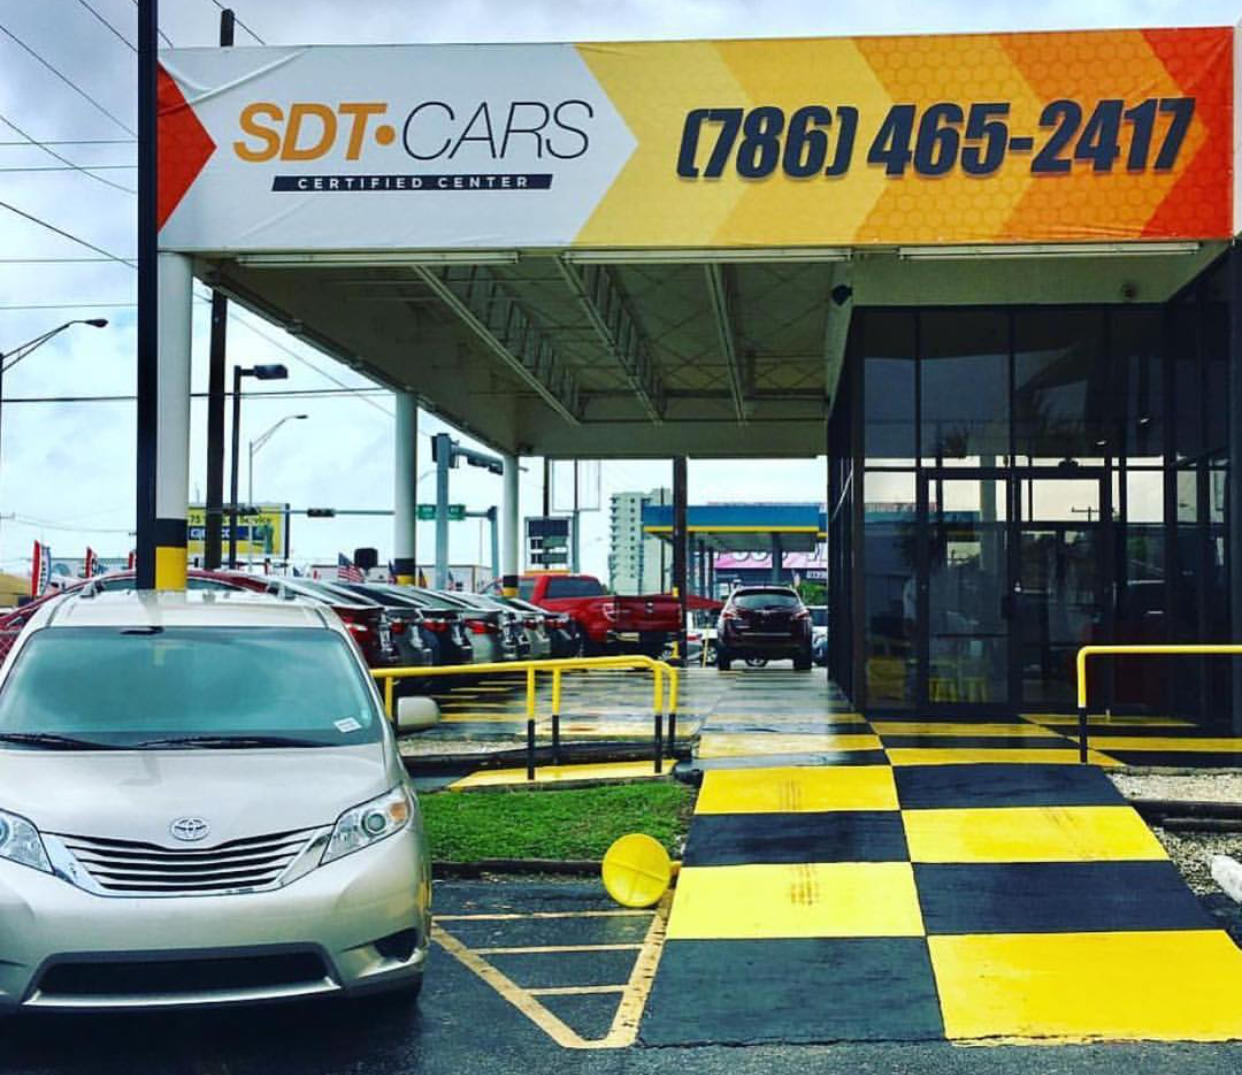 SDT Cars image 0